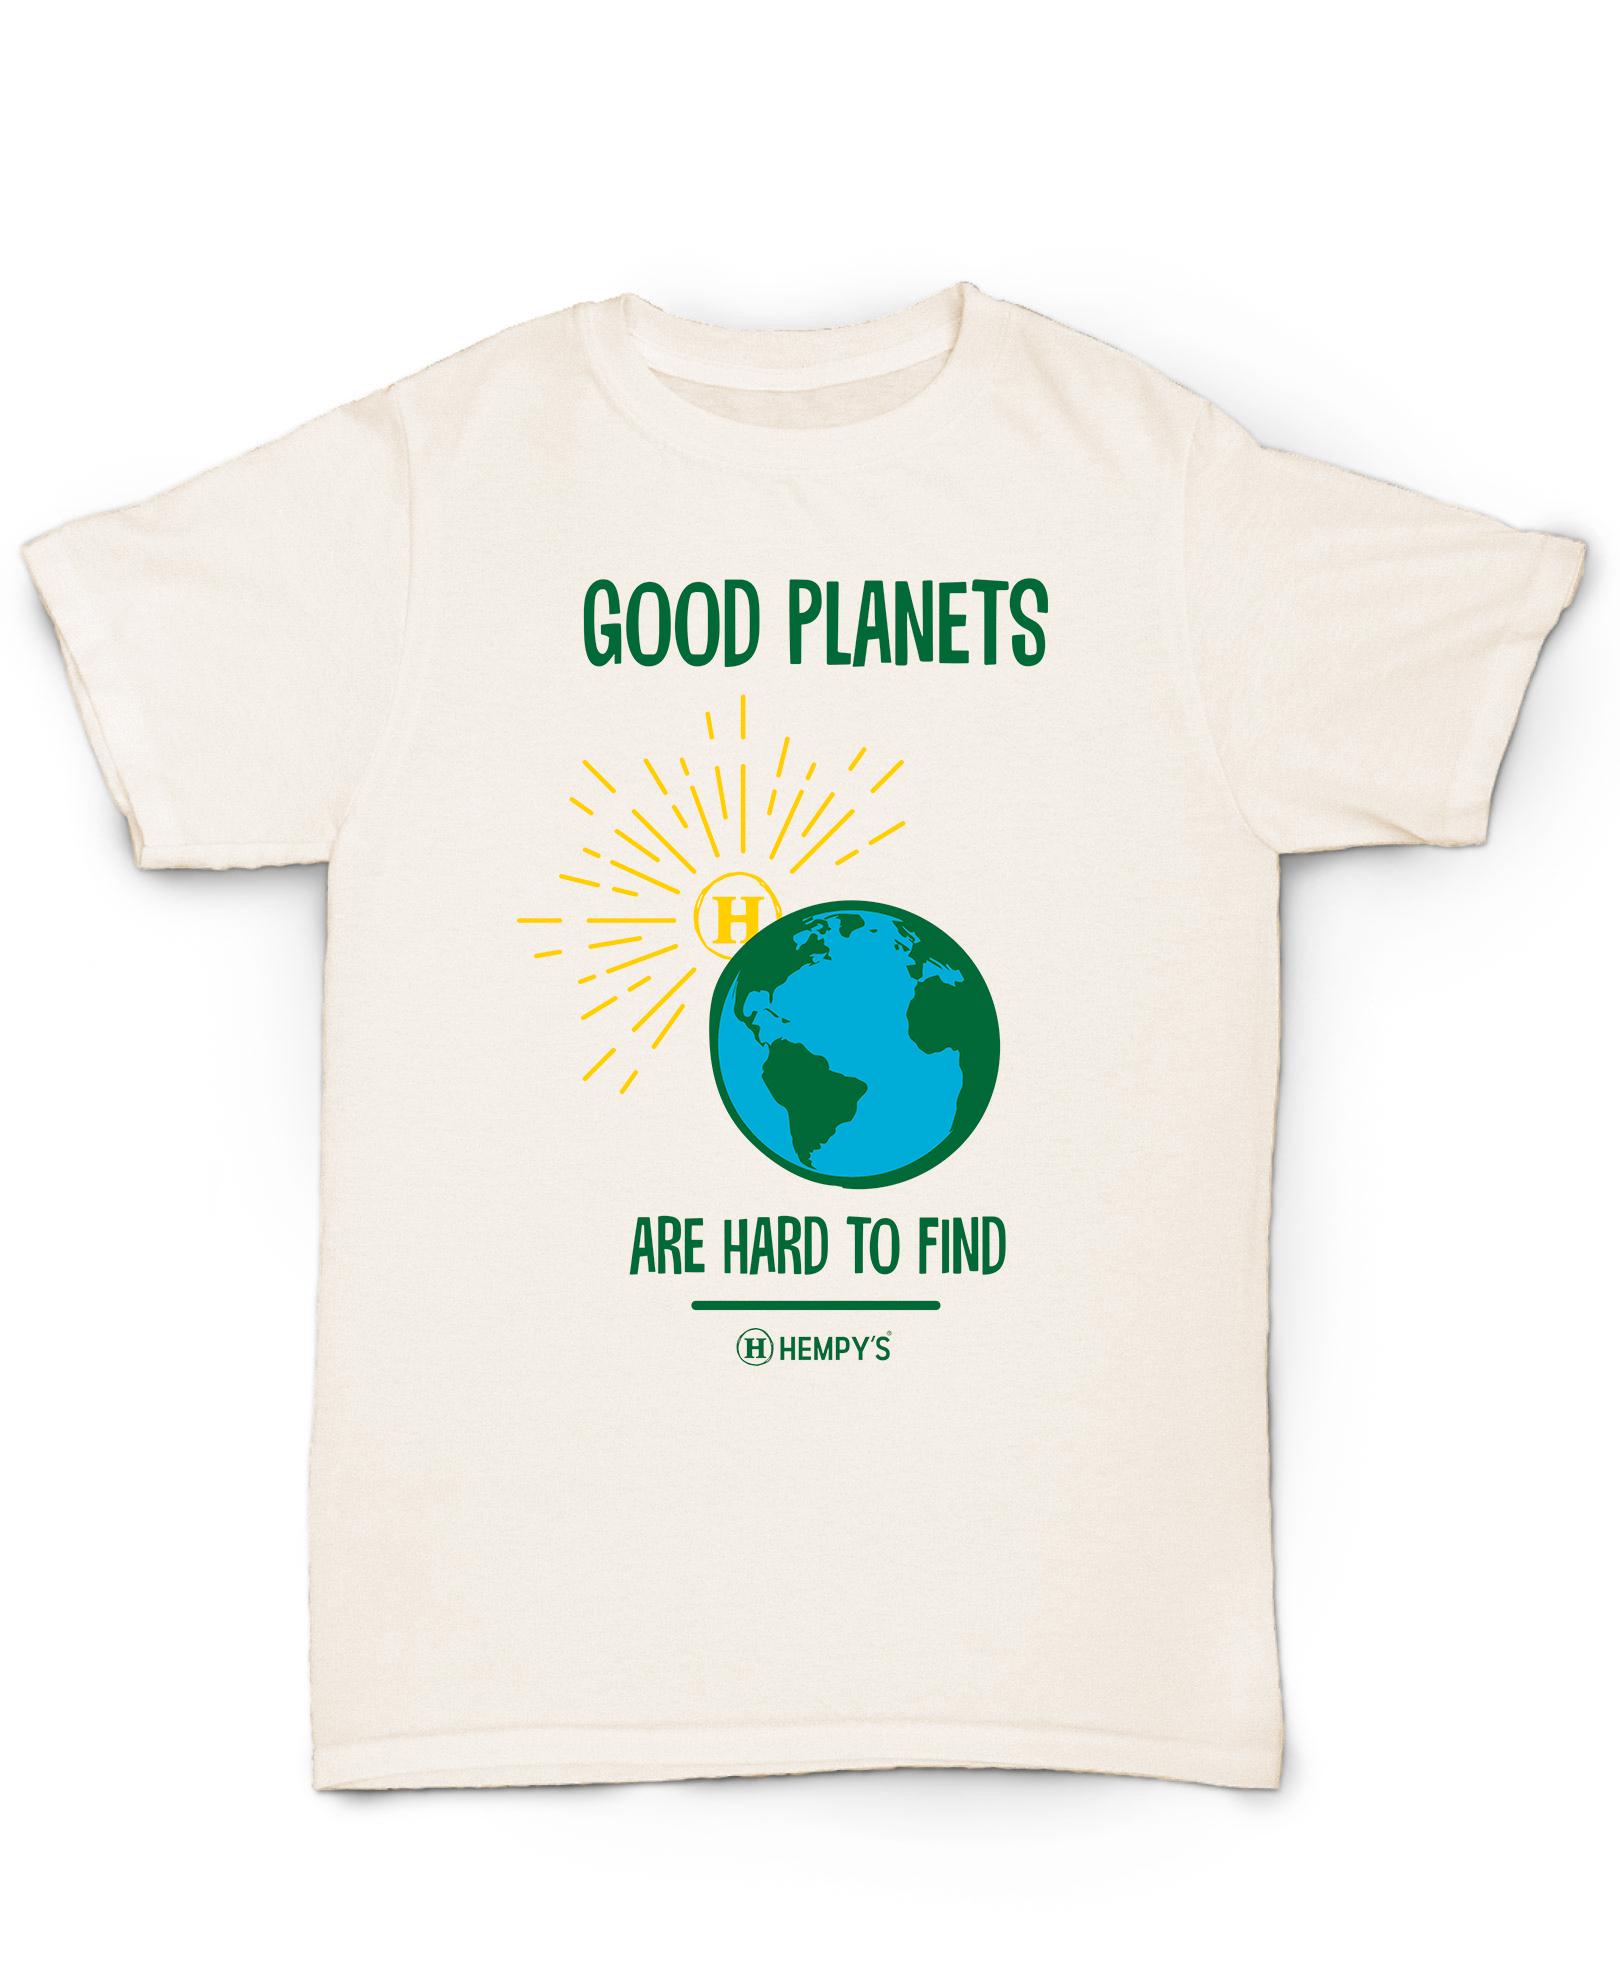 Hemp T Shirt  HEMPY'S  Good Planets